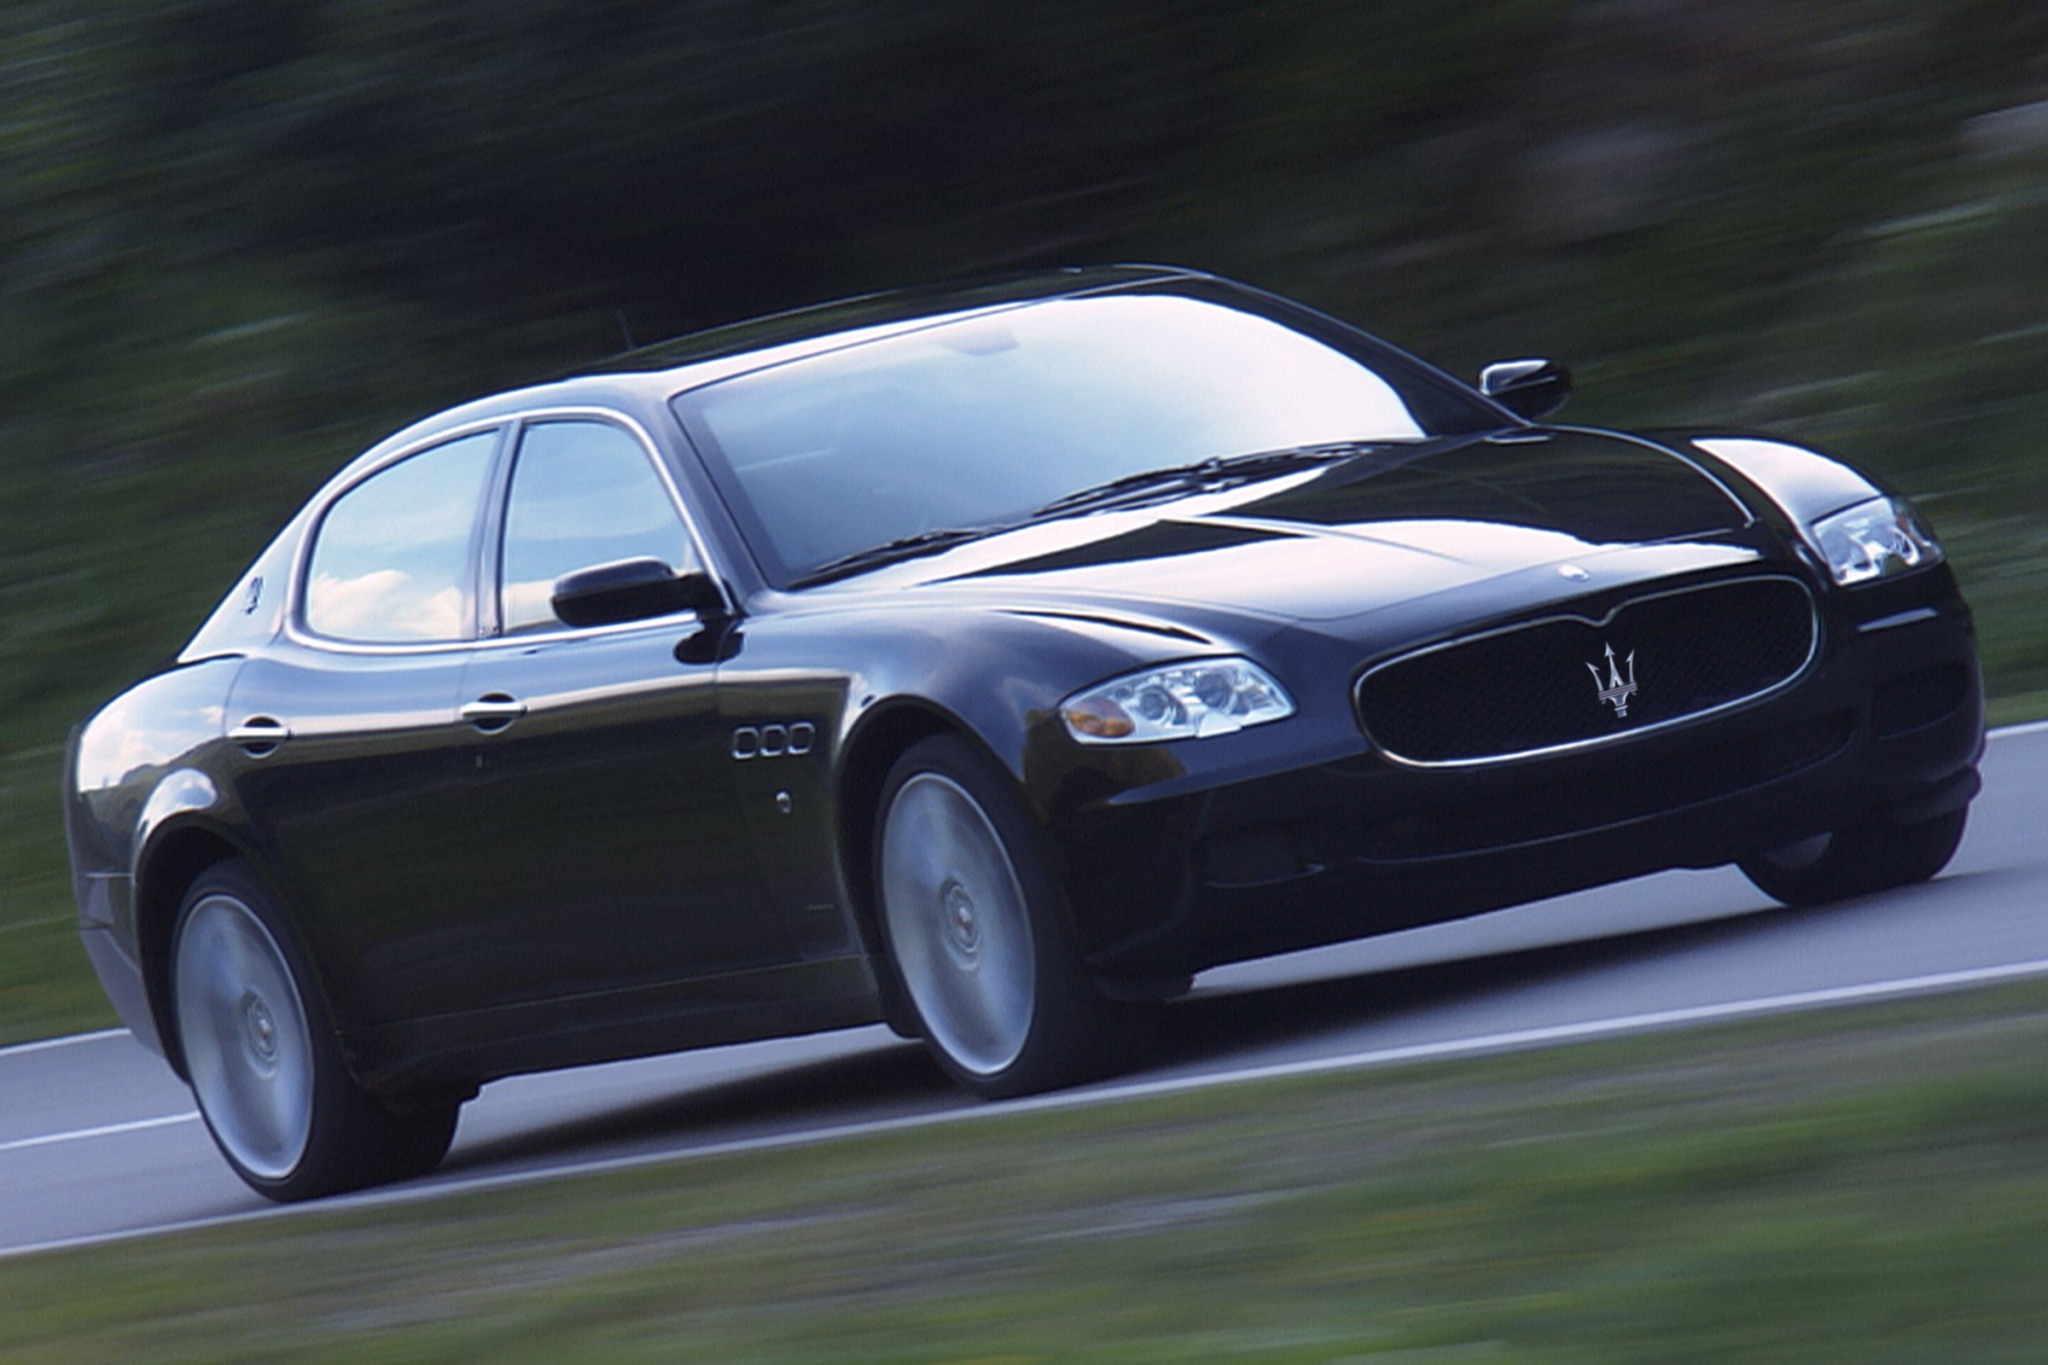 2007 maserati quattroporte sedan sport gt automatic fq oem 2 2048